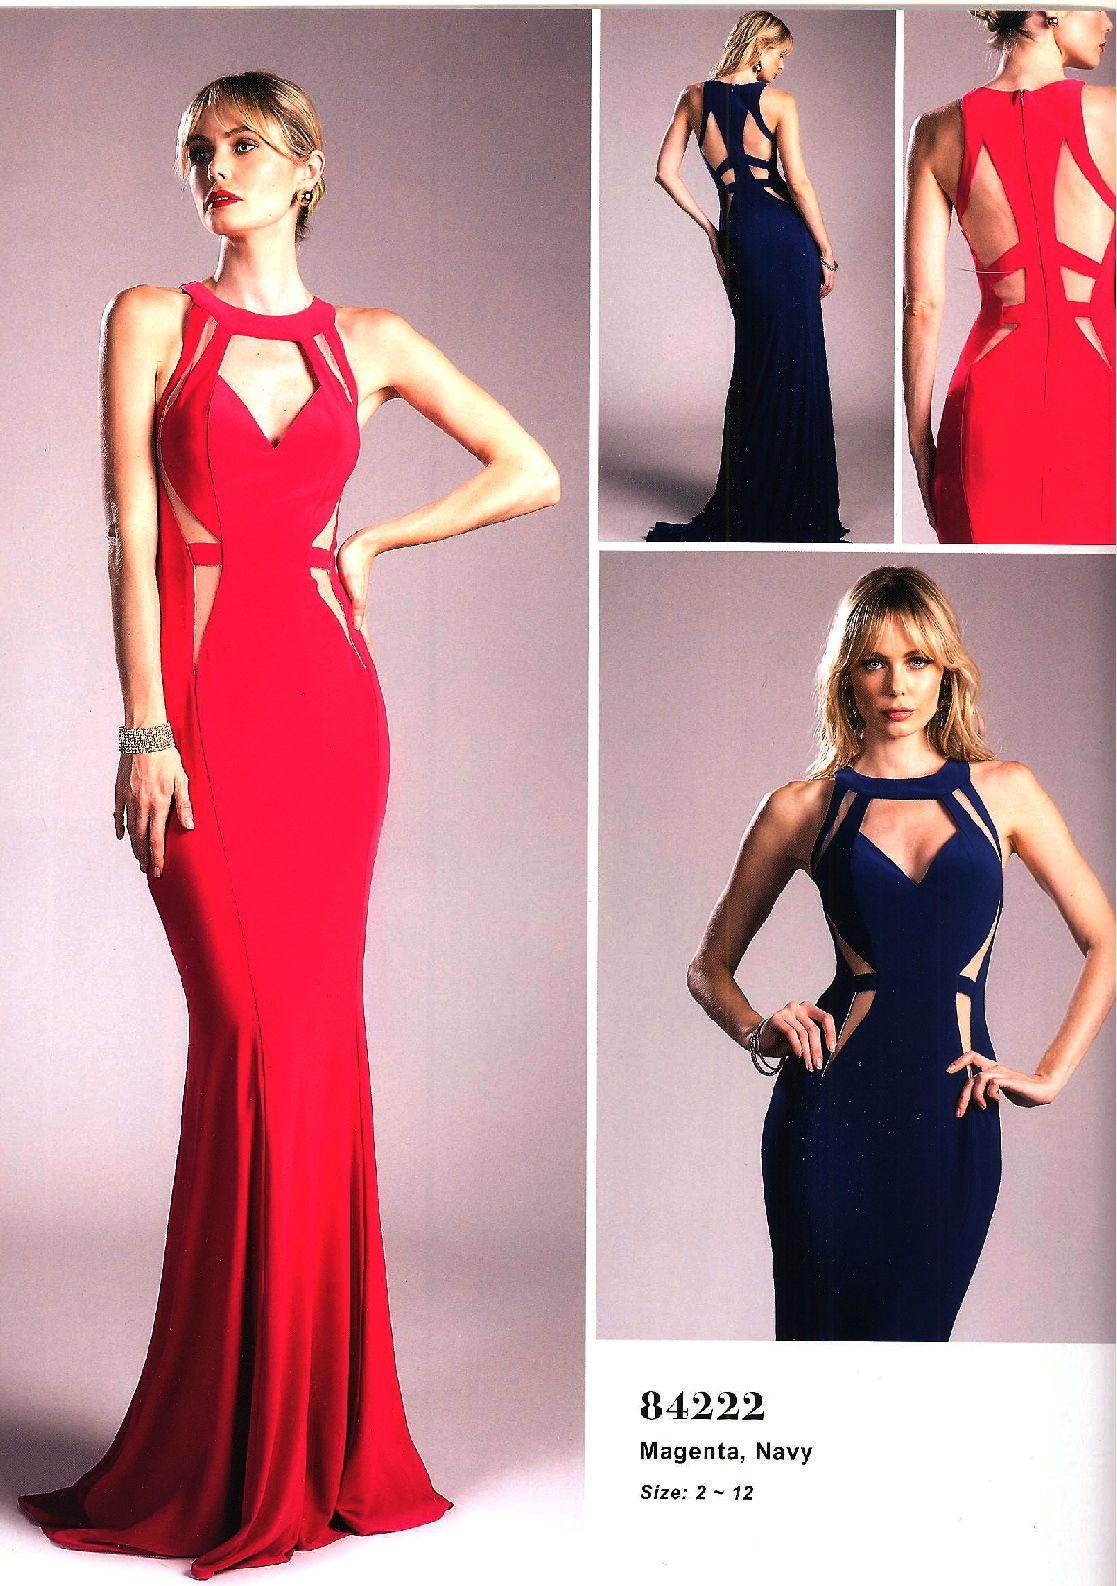 Prom dresses evening dresses by cinderellaucbrueadducbruesilhouette